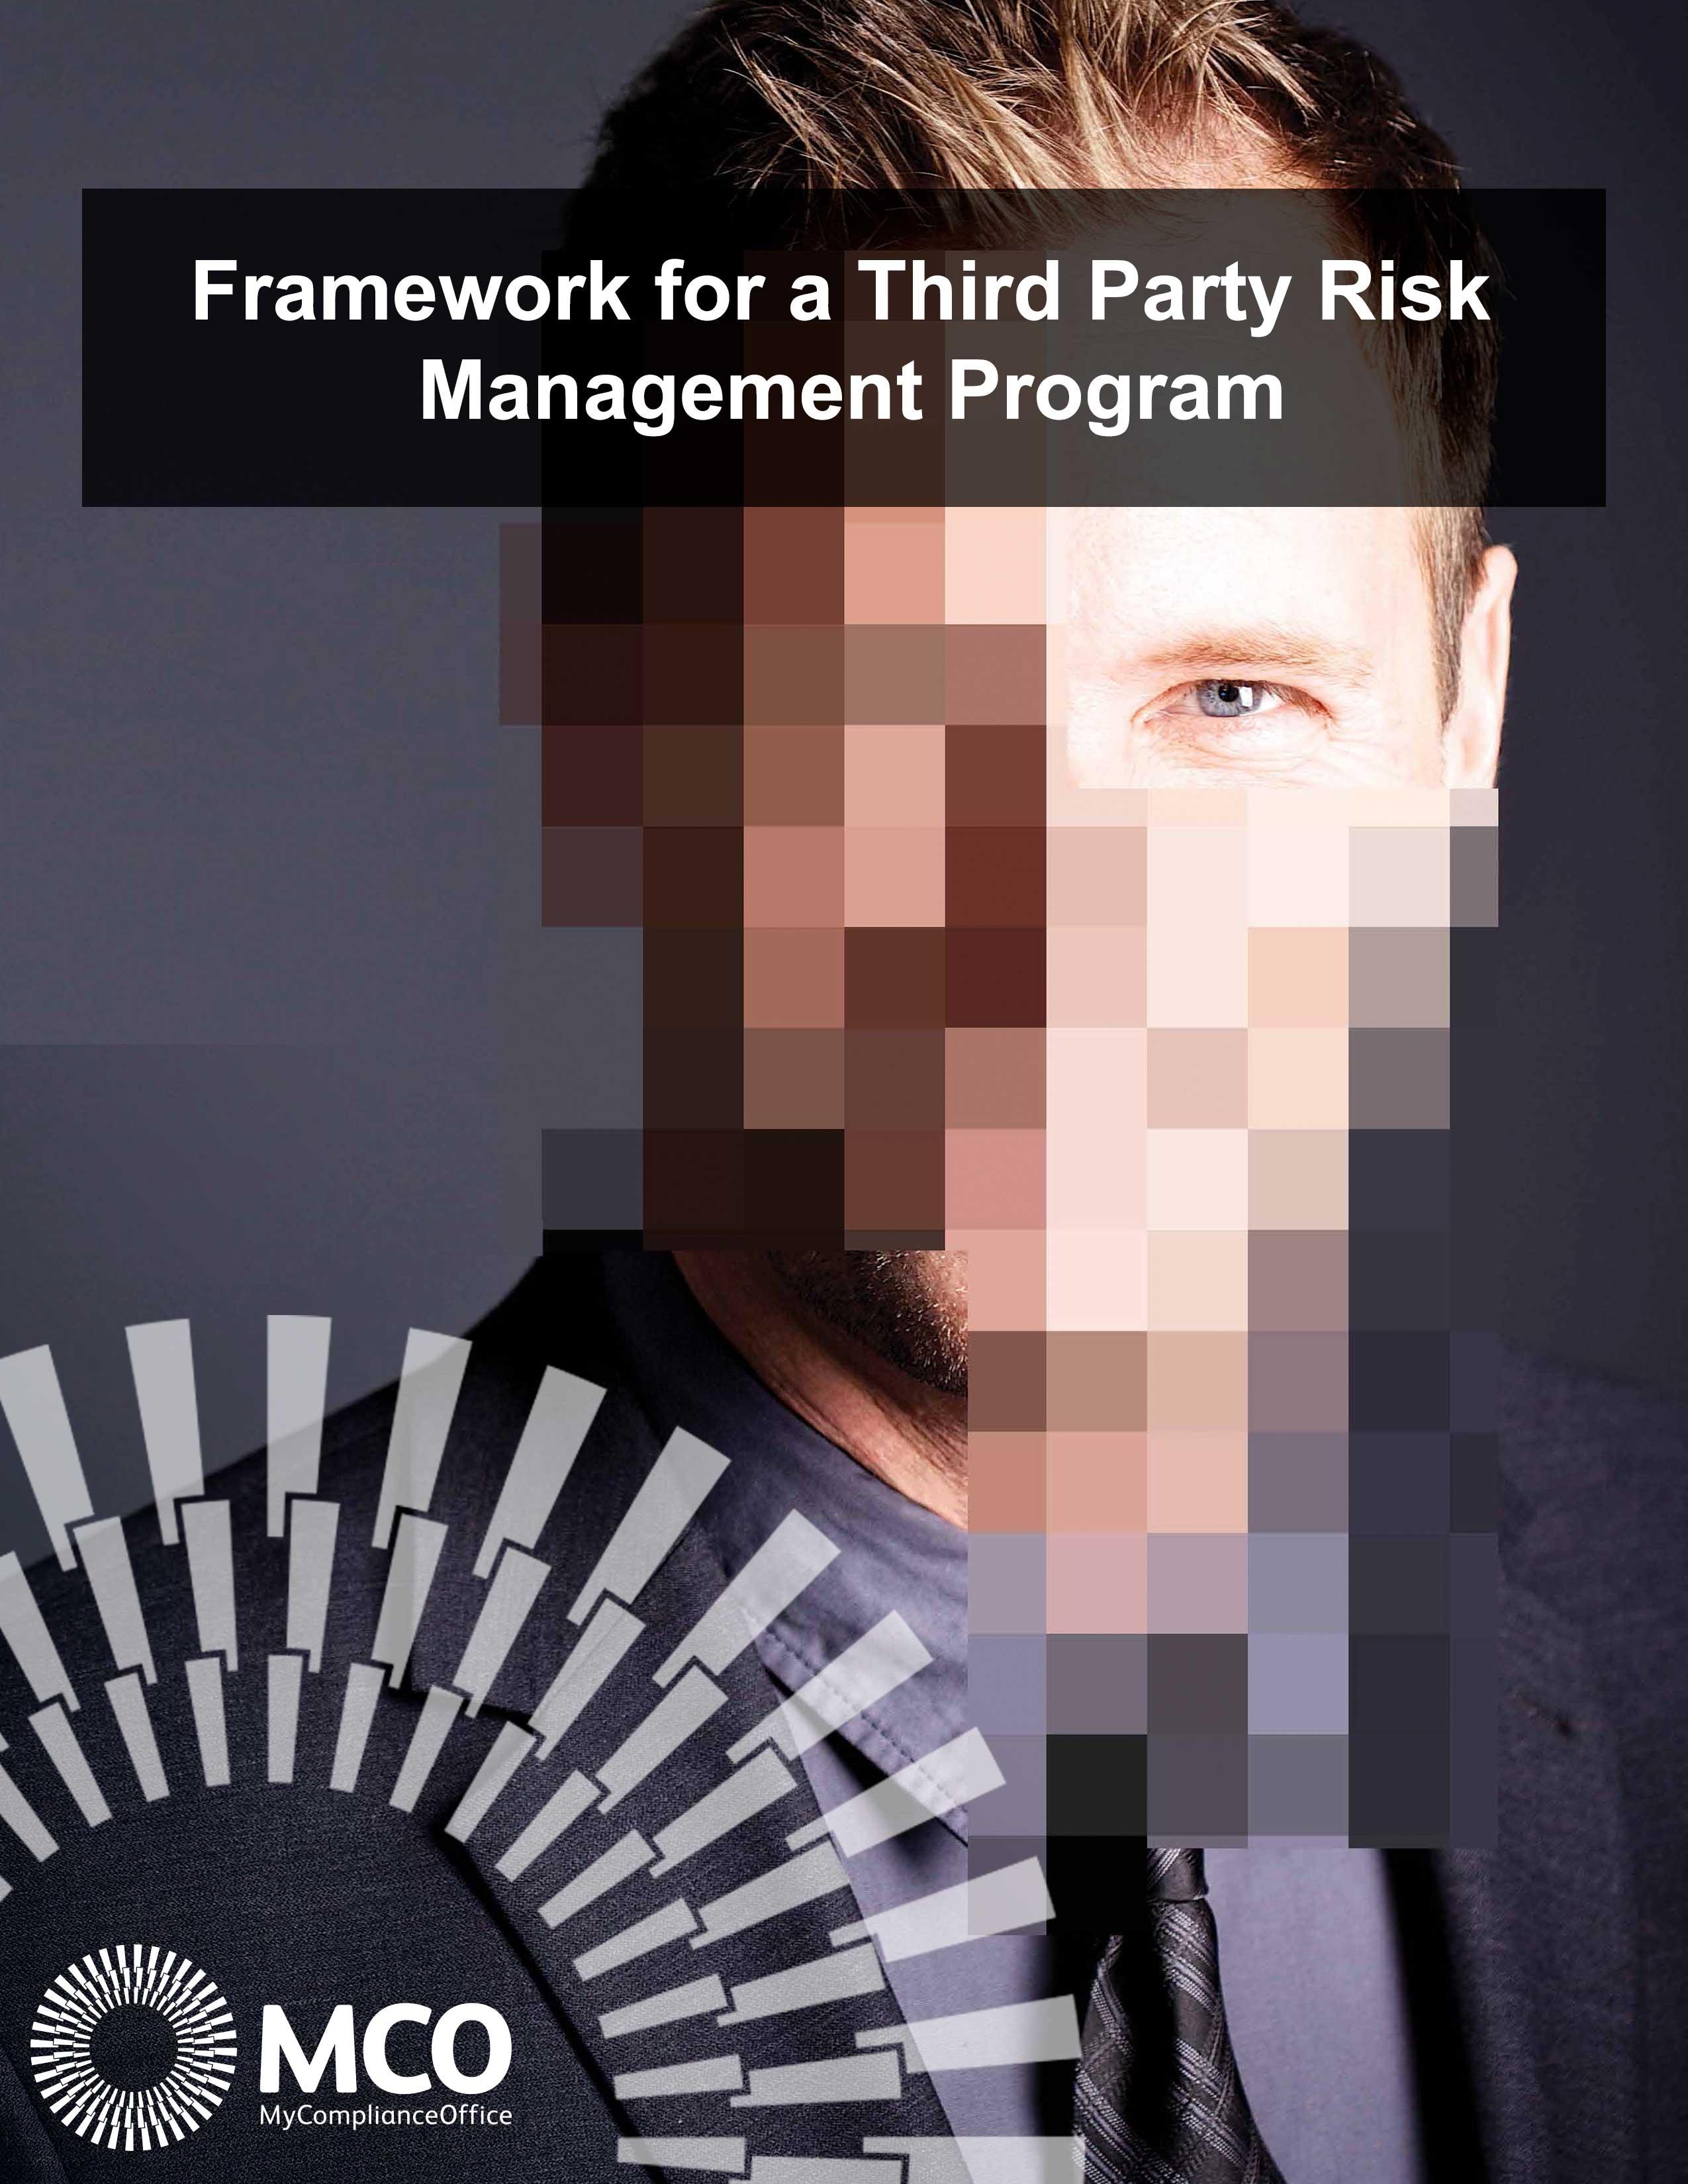 Framework-for-a-Third-Party-Risk-Management-Program